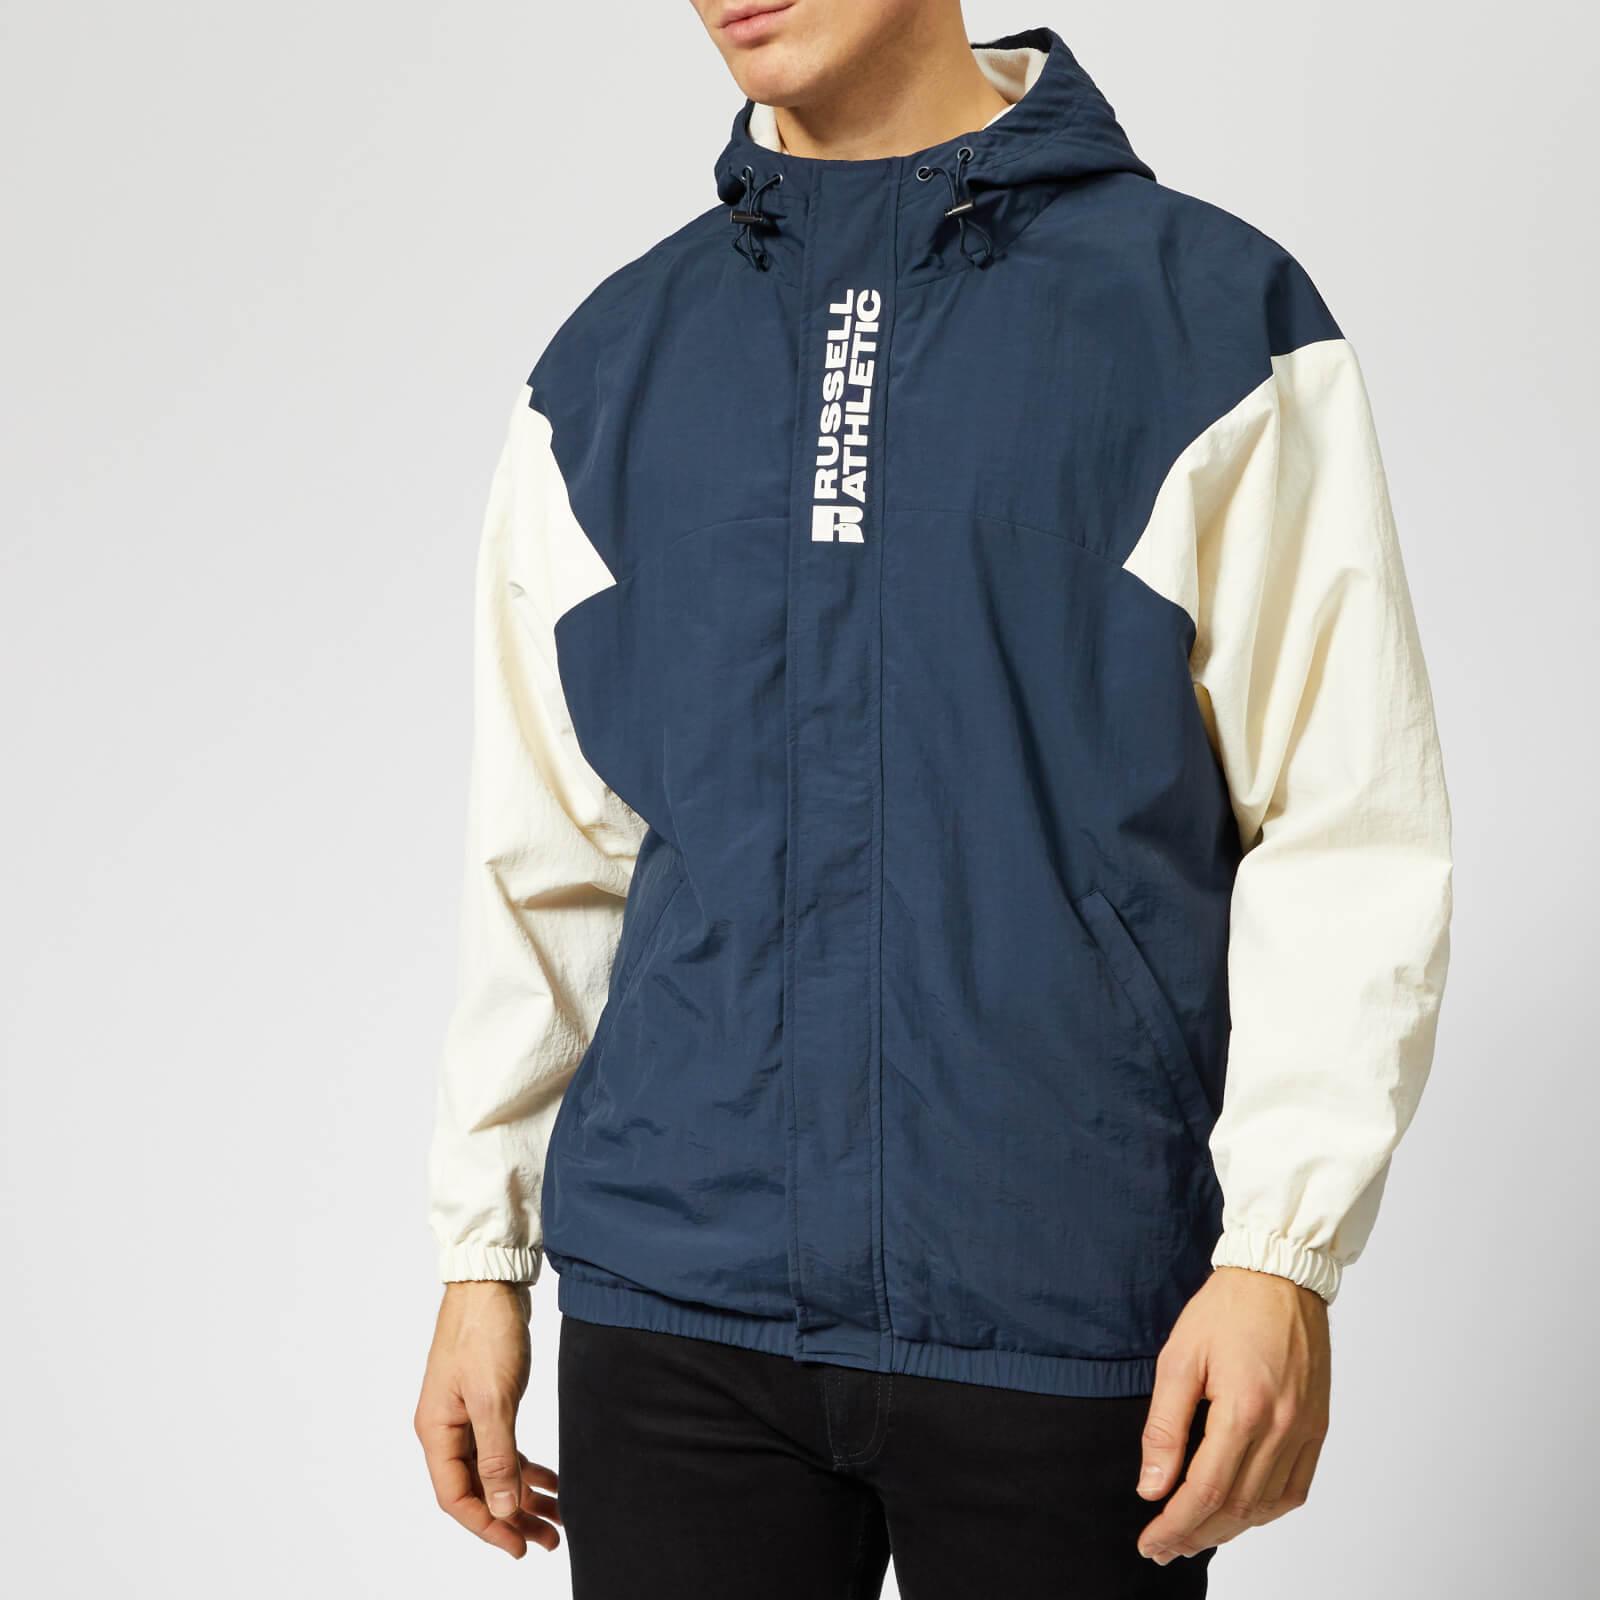 Russell Athletic Men's Bradley Hooded Sport Jacket - Navy - M - Navy